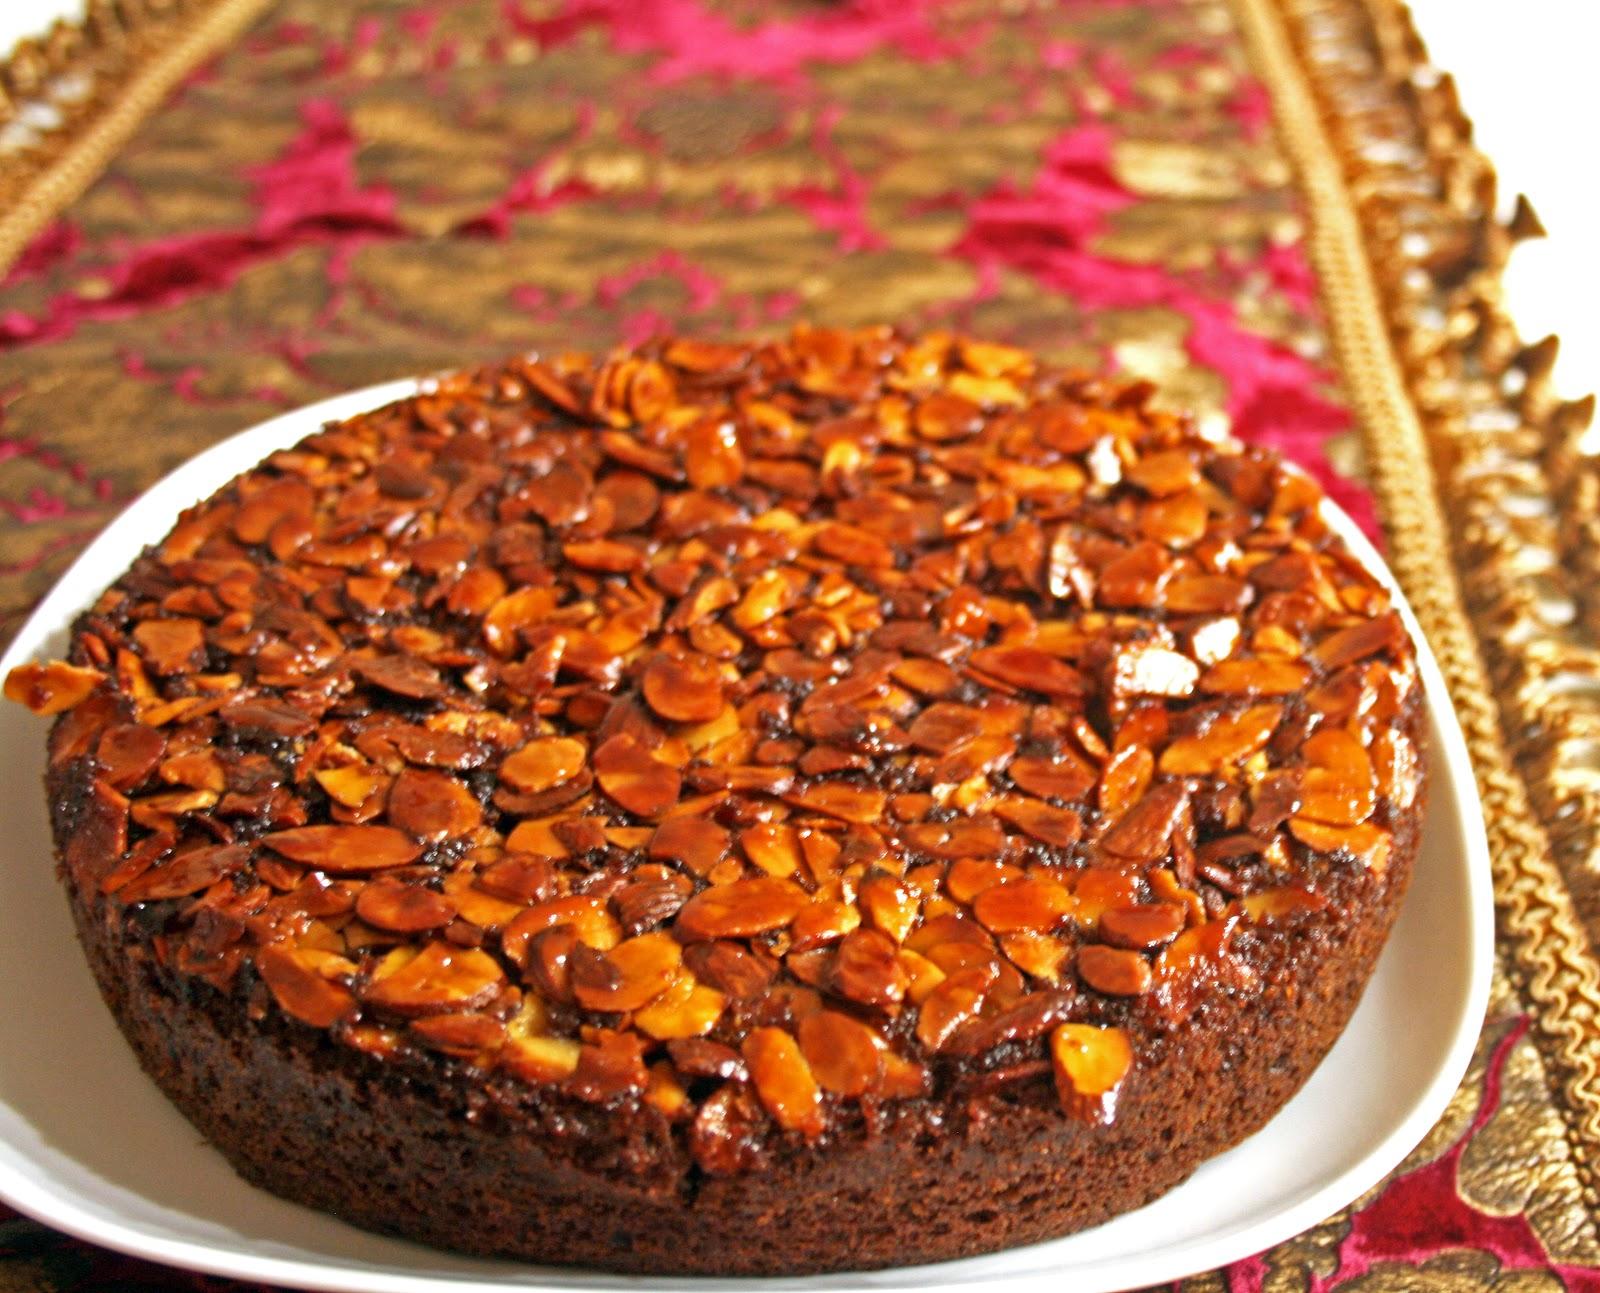 Martha Stewart Chocolate Almond Upside Down Cake